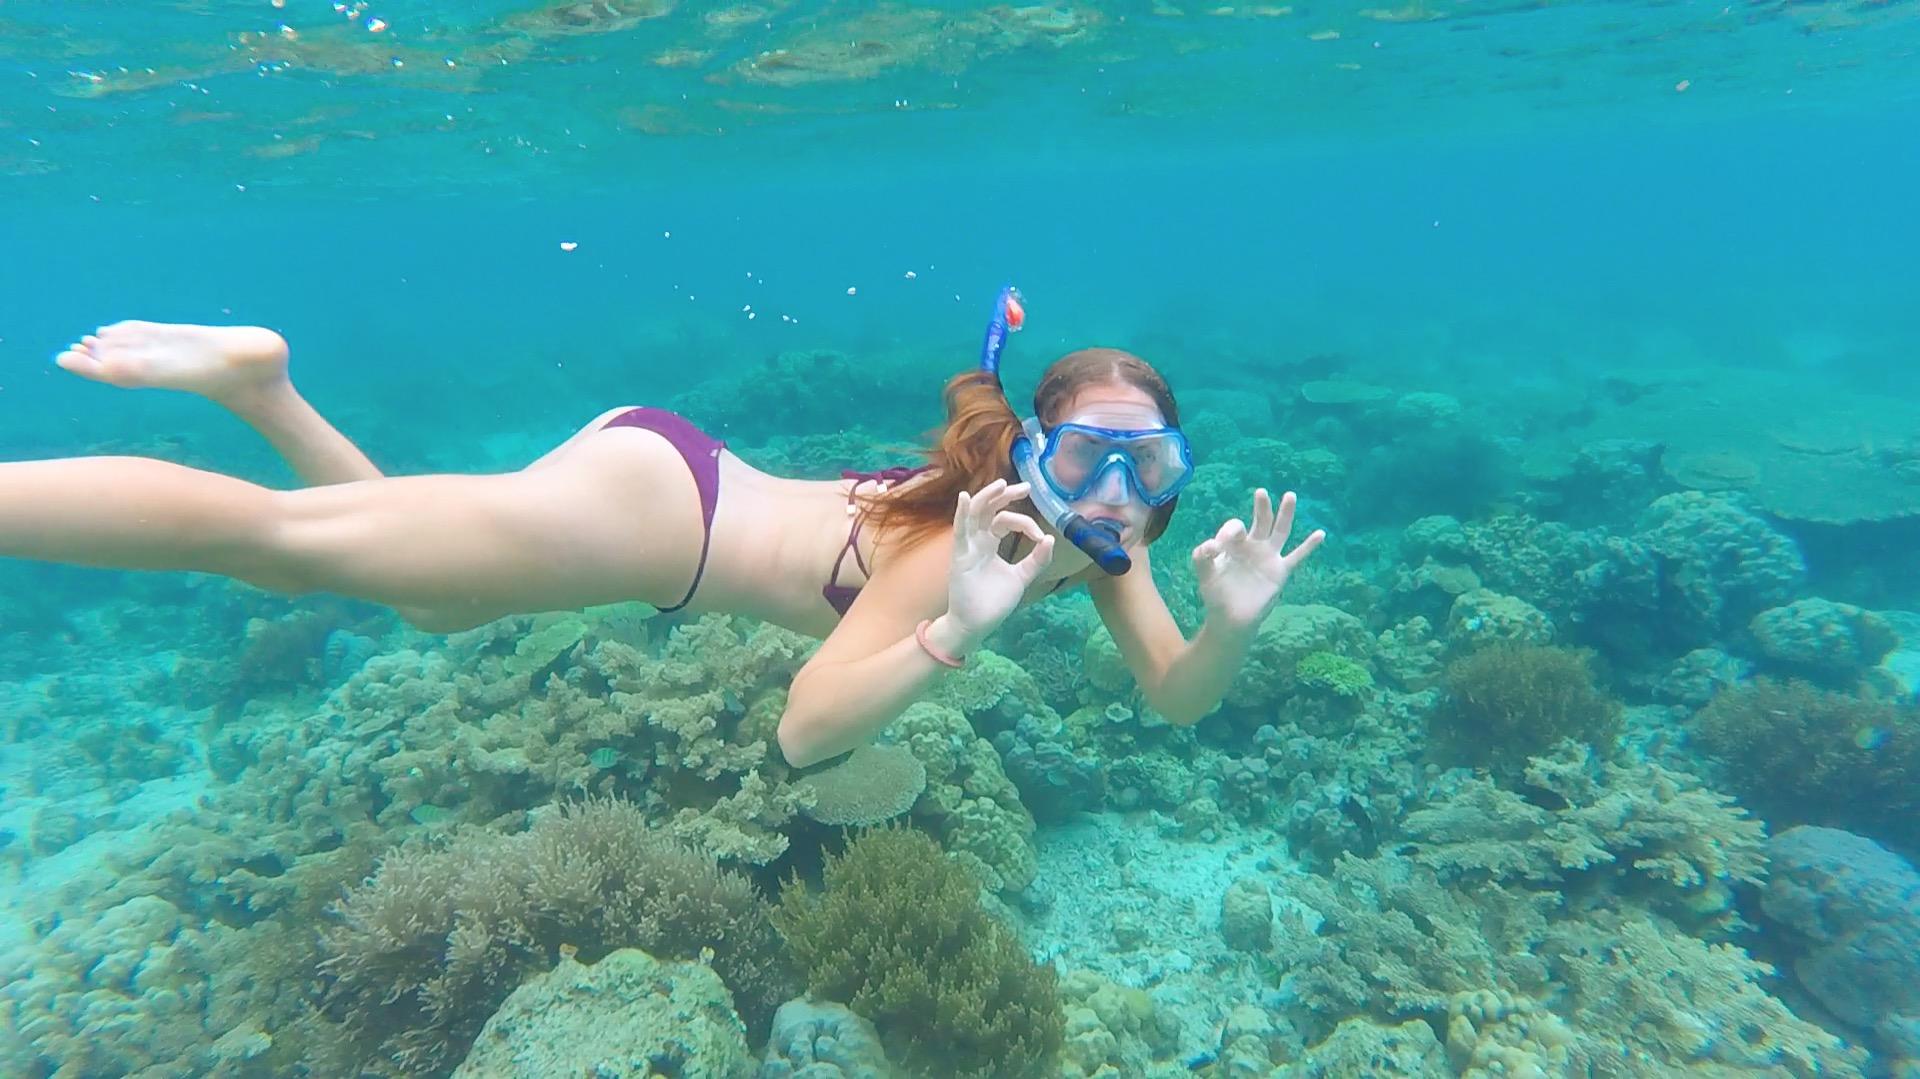 Filipijnen, wereldreis, Palawan, El Nido, port barton, snorkelen, backpacken, rondreis, rondreizen, tour, schildpad, vakantie